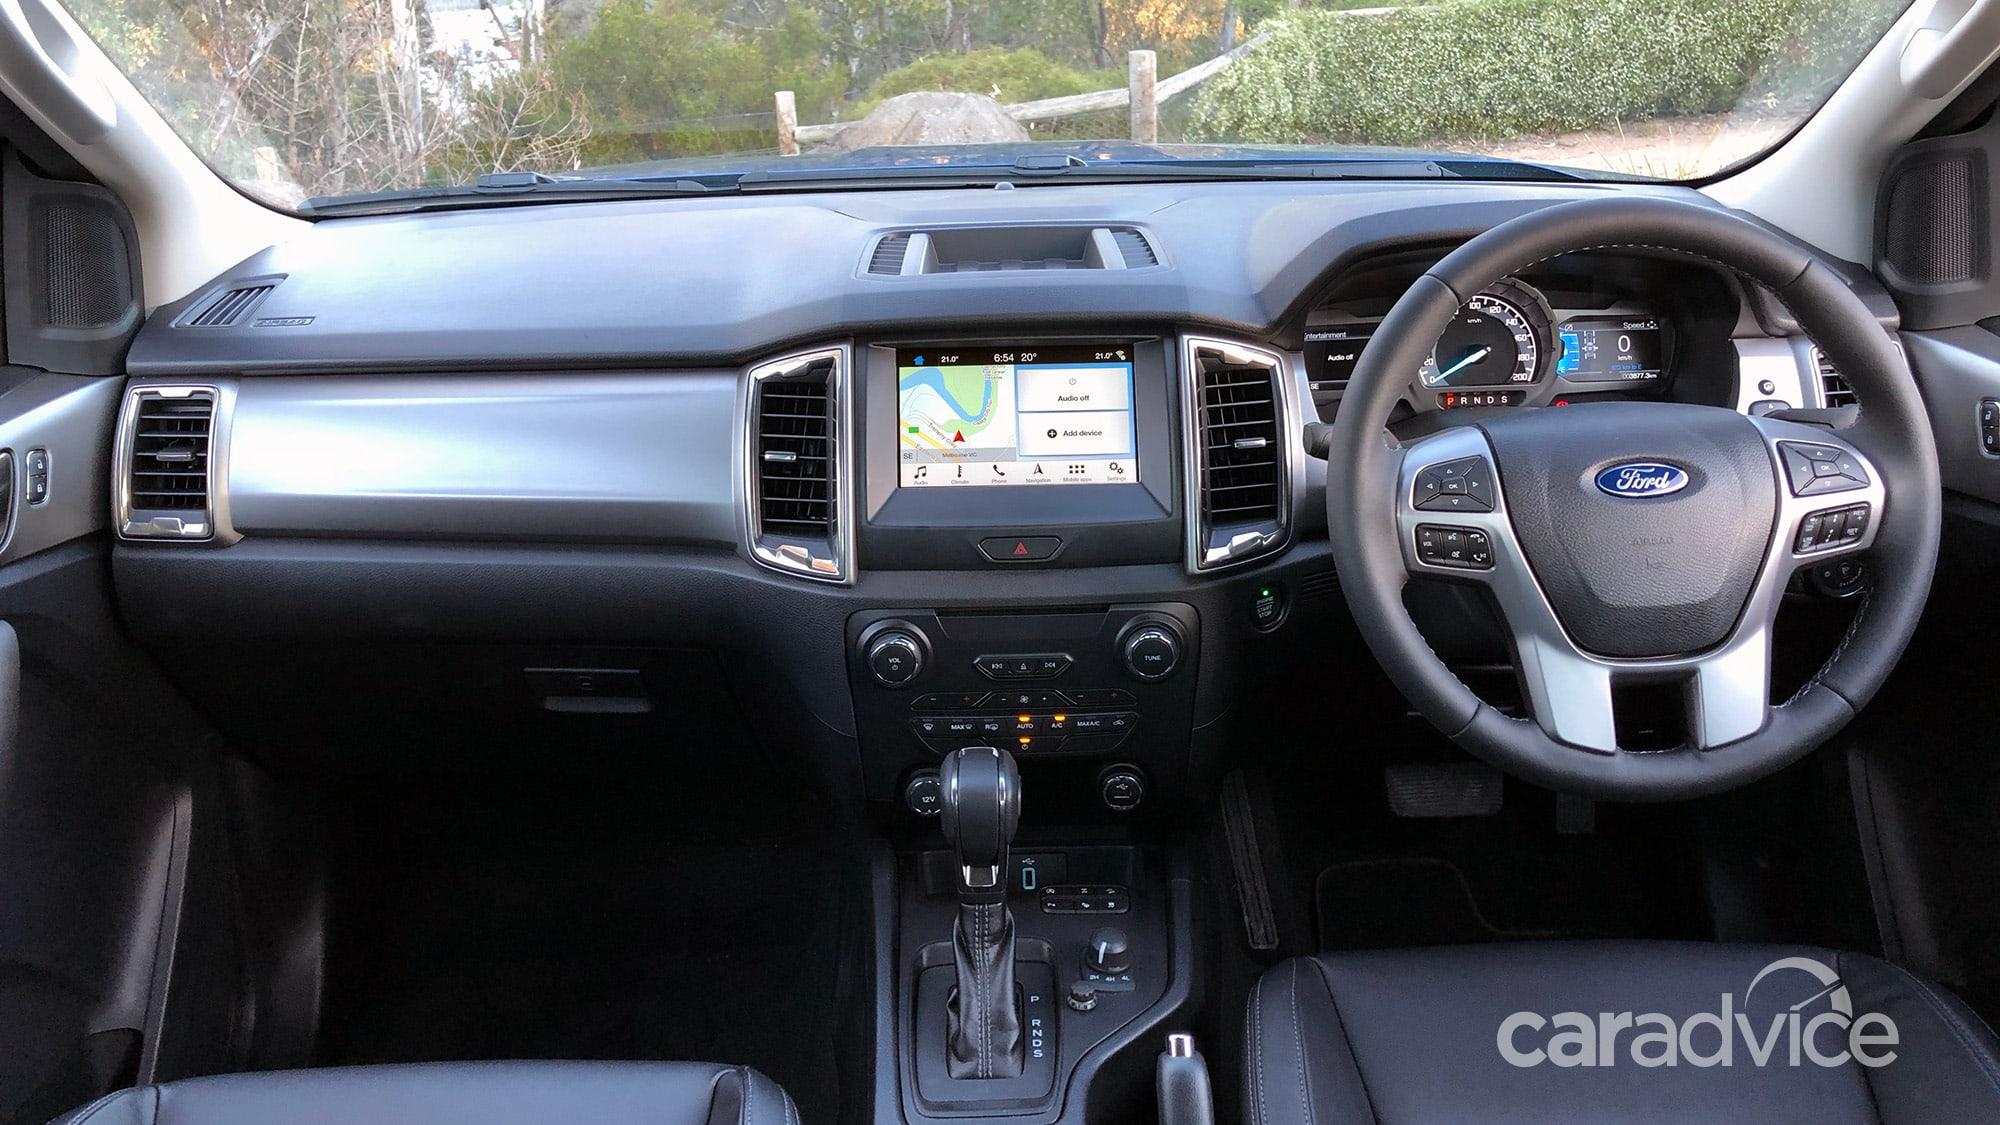 2019 Ford Ranger XLT review: 2.0 Bi-Turbo - photos | CarAdvice